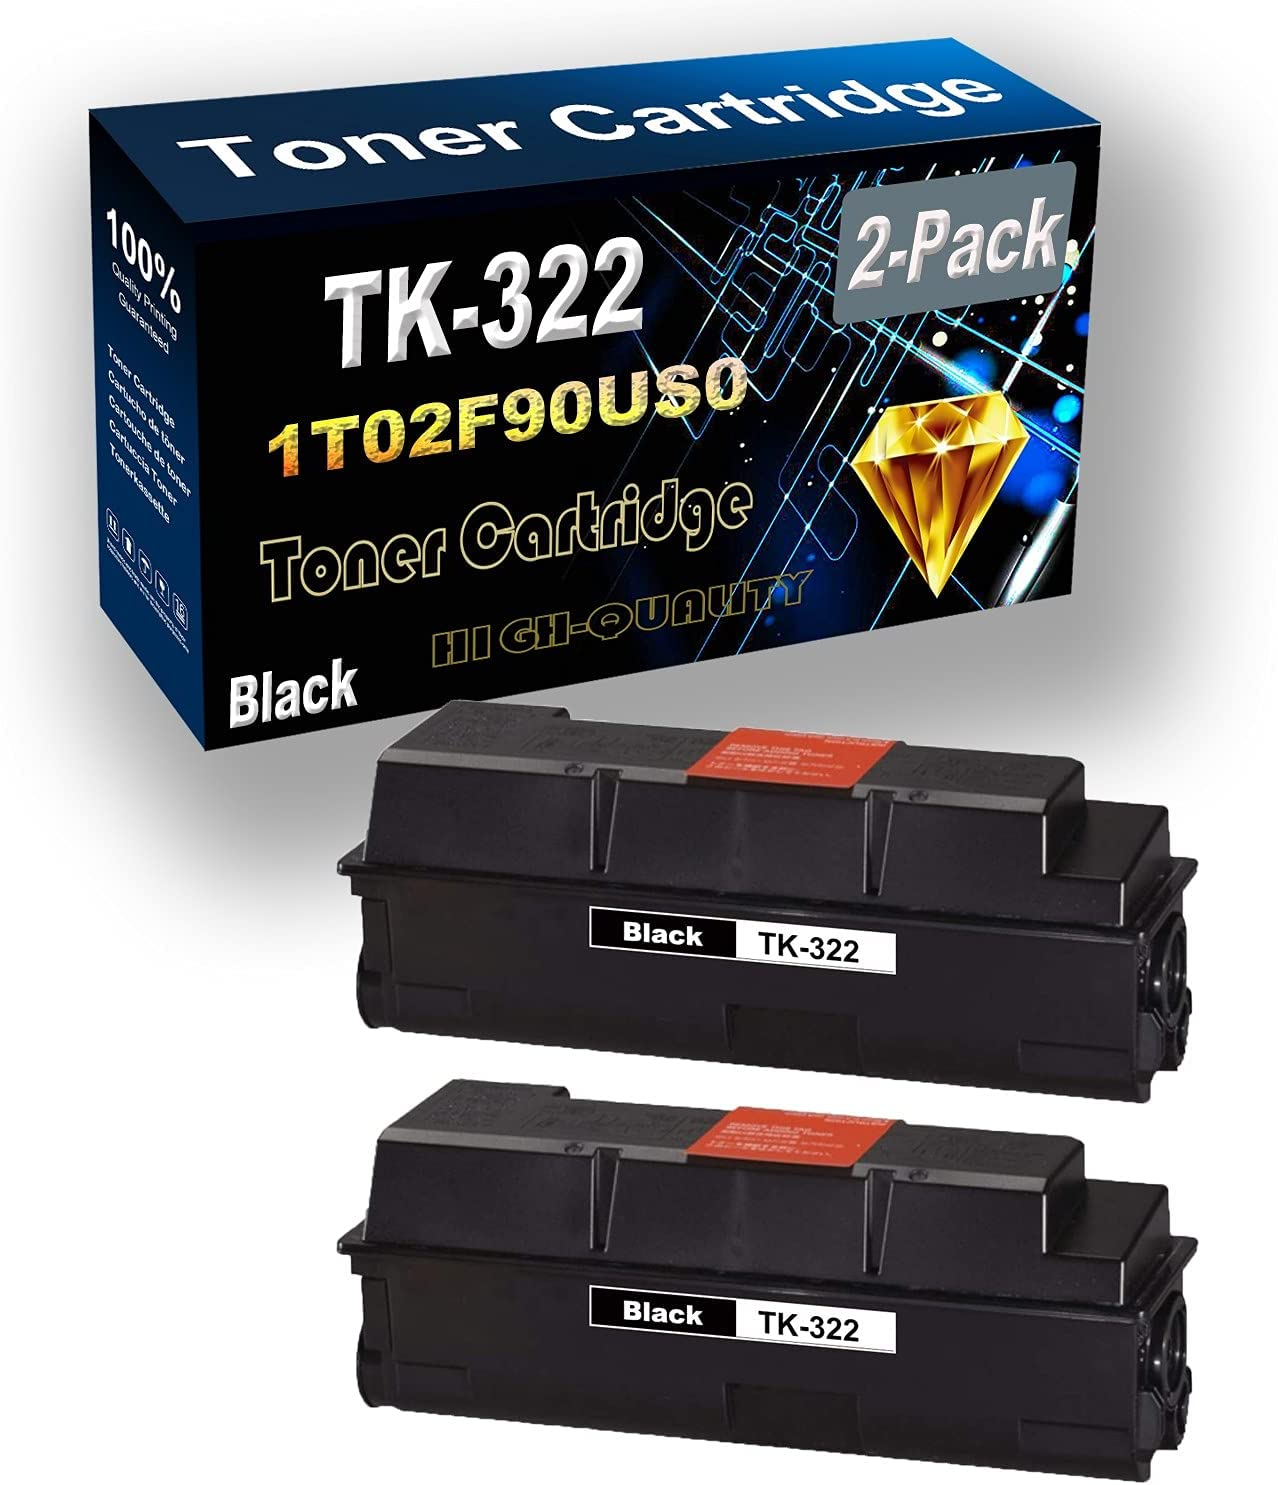 Remanufactured Toner Cartridge Replacement for Kyocera TK322 TK-322 | 1T02F90US0 for Kyocera FS-3900DN FS-4000DN Printer (2-Pack Black)